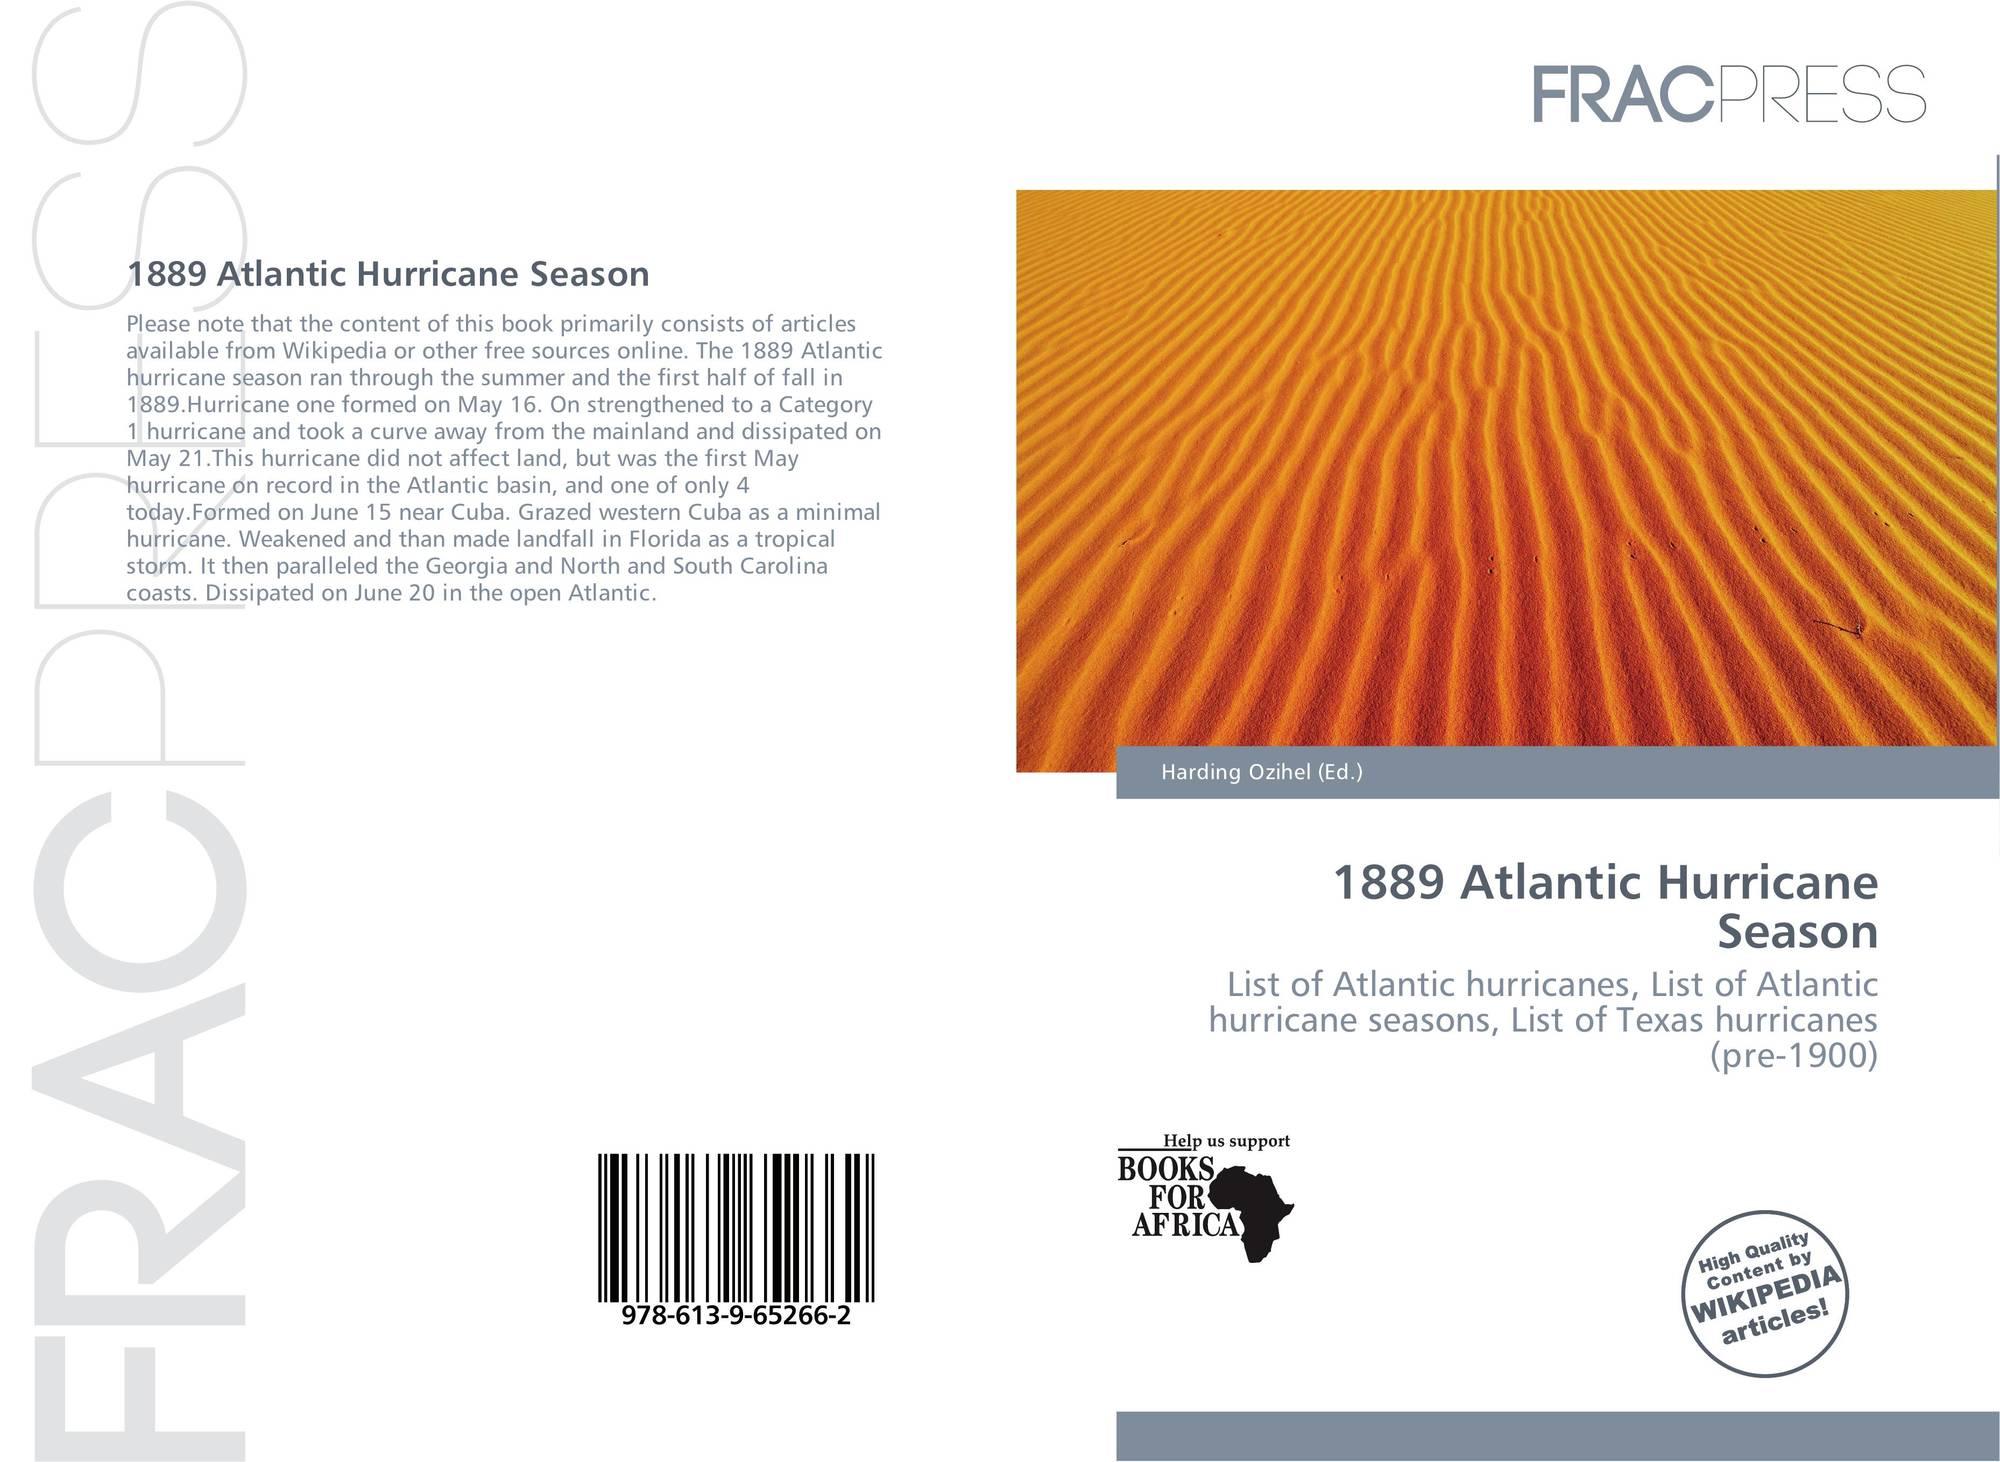 1889 Atlantic hurricane season